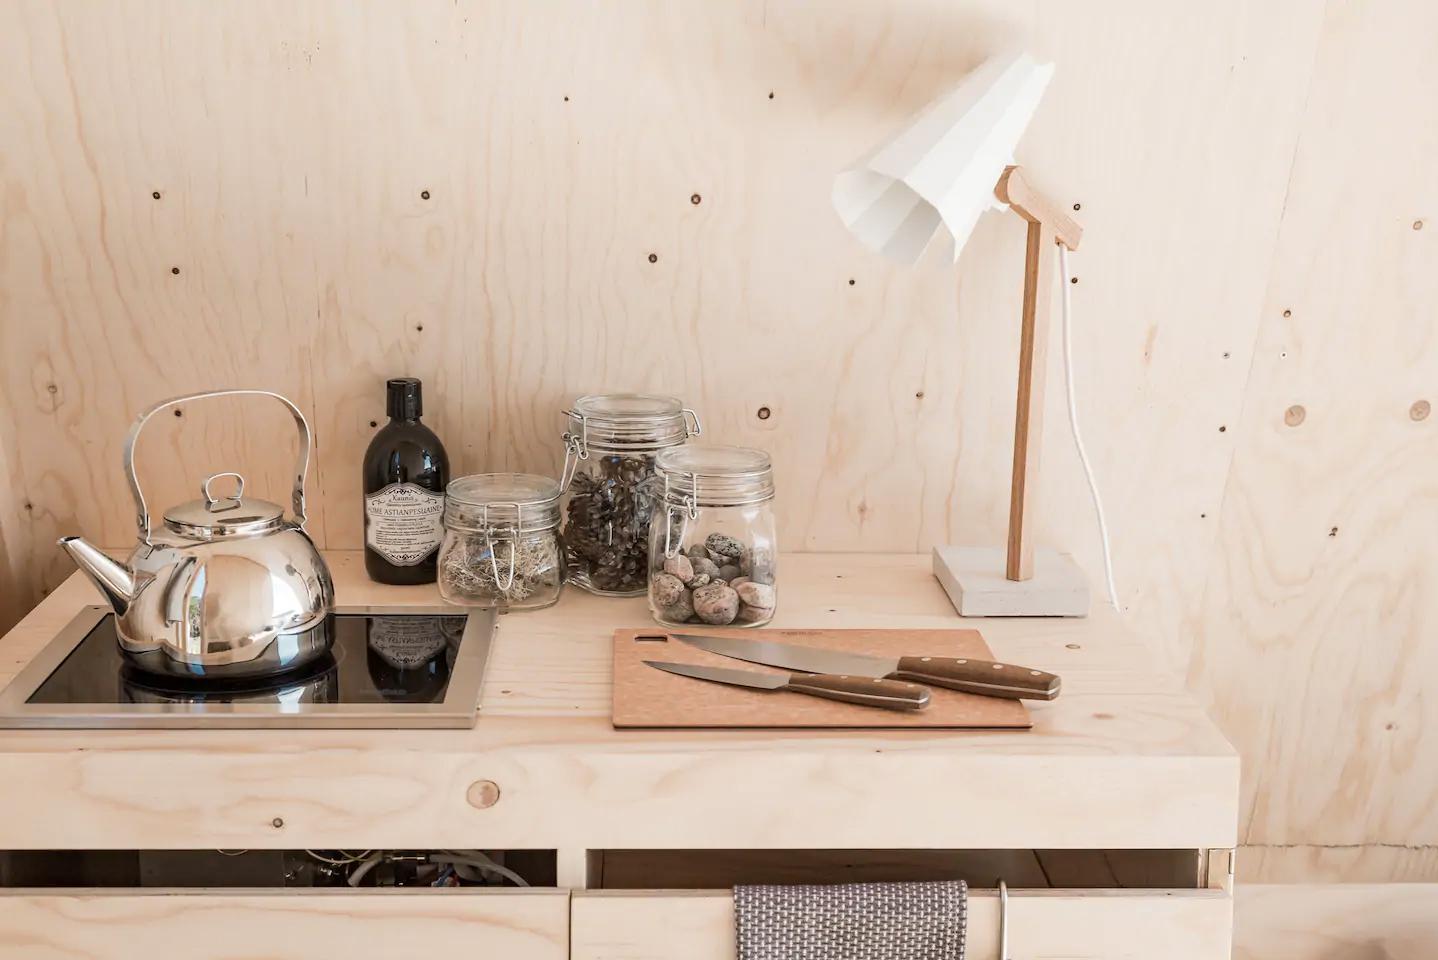 Nolla A-frame cabin lets you live off-grid in Helsinki